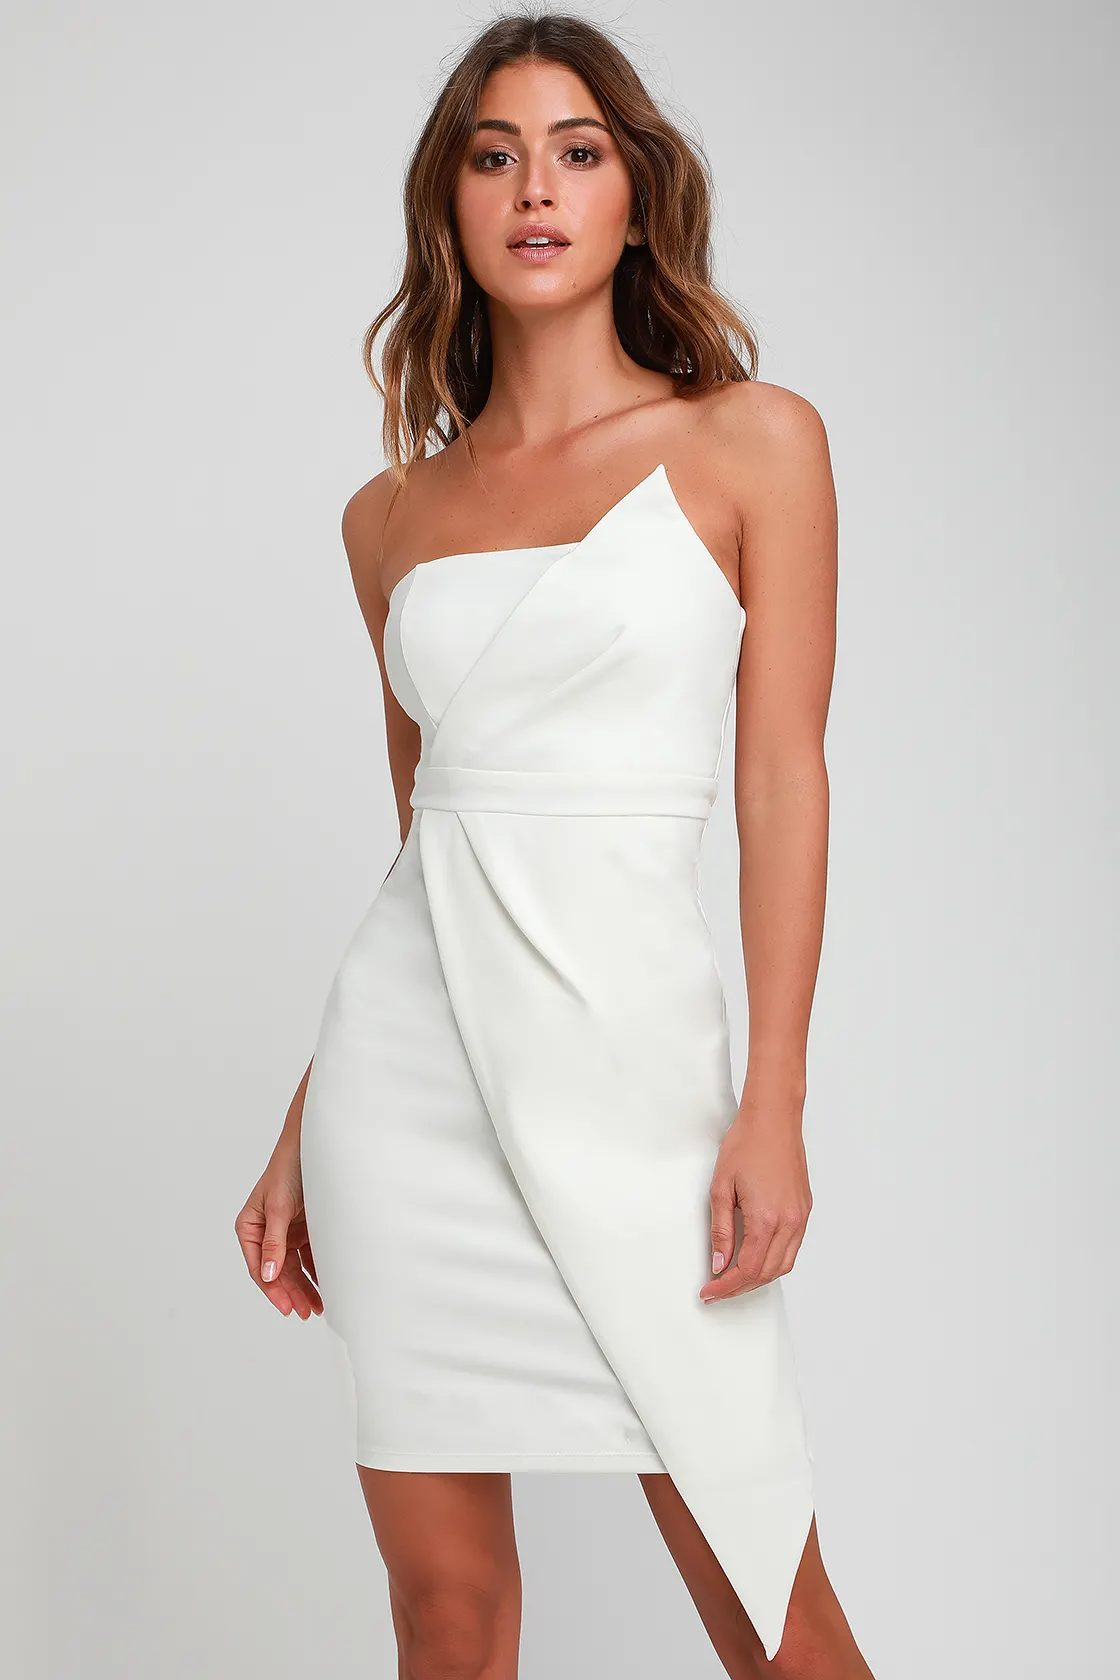 Elegant white graduation dress